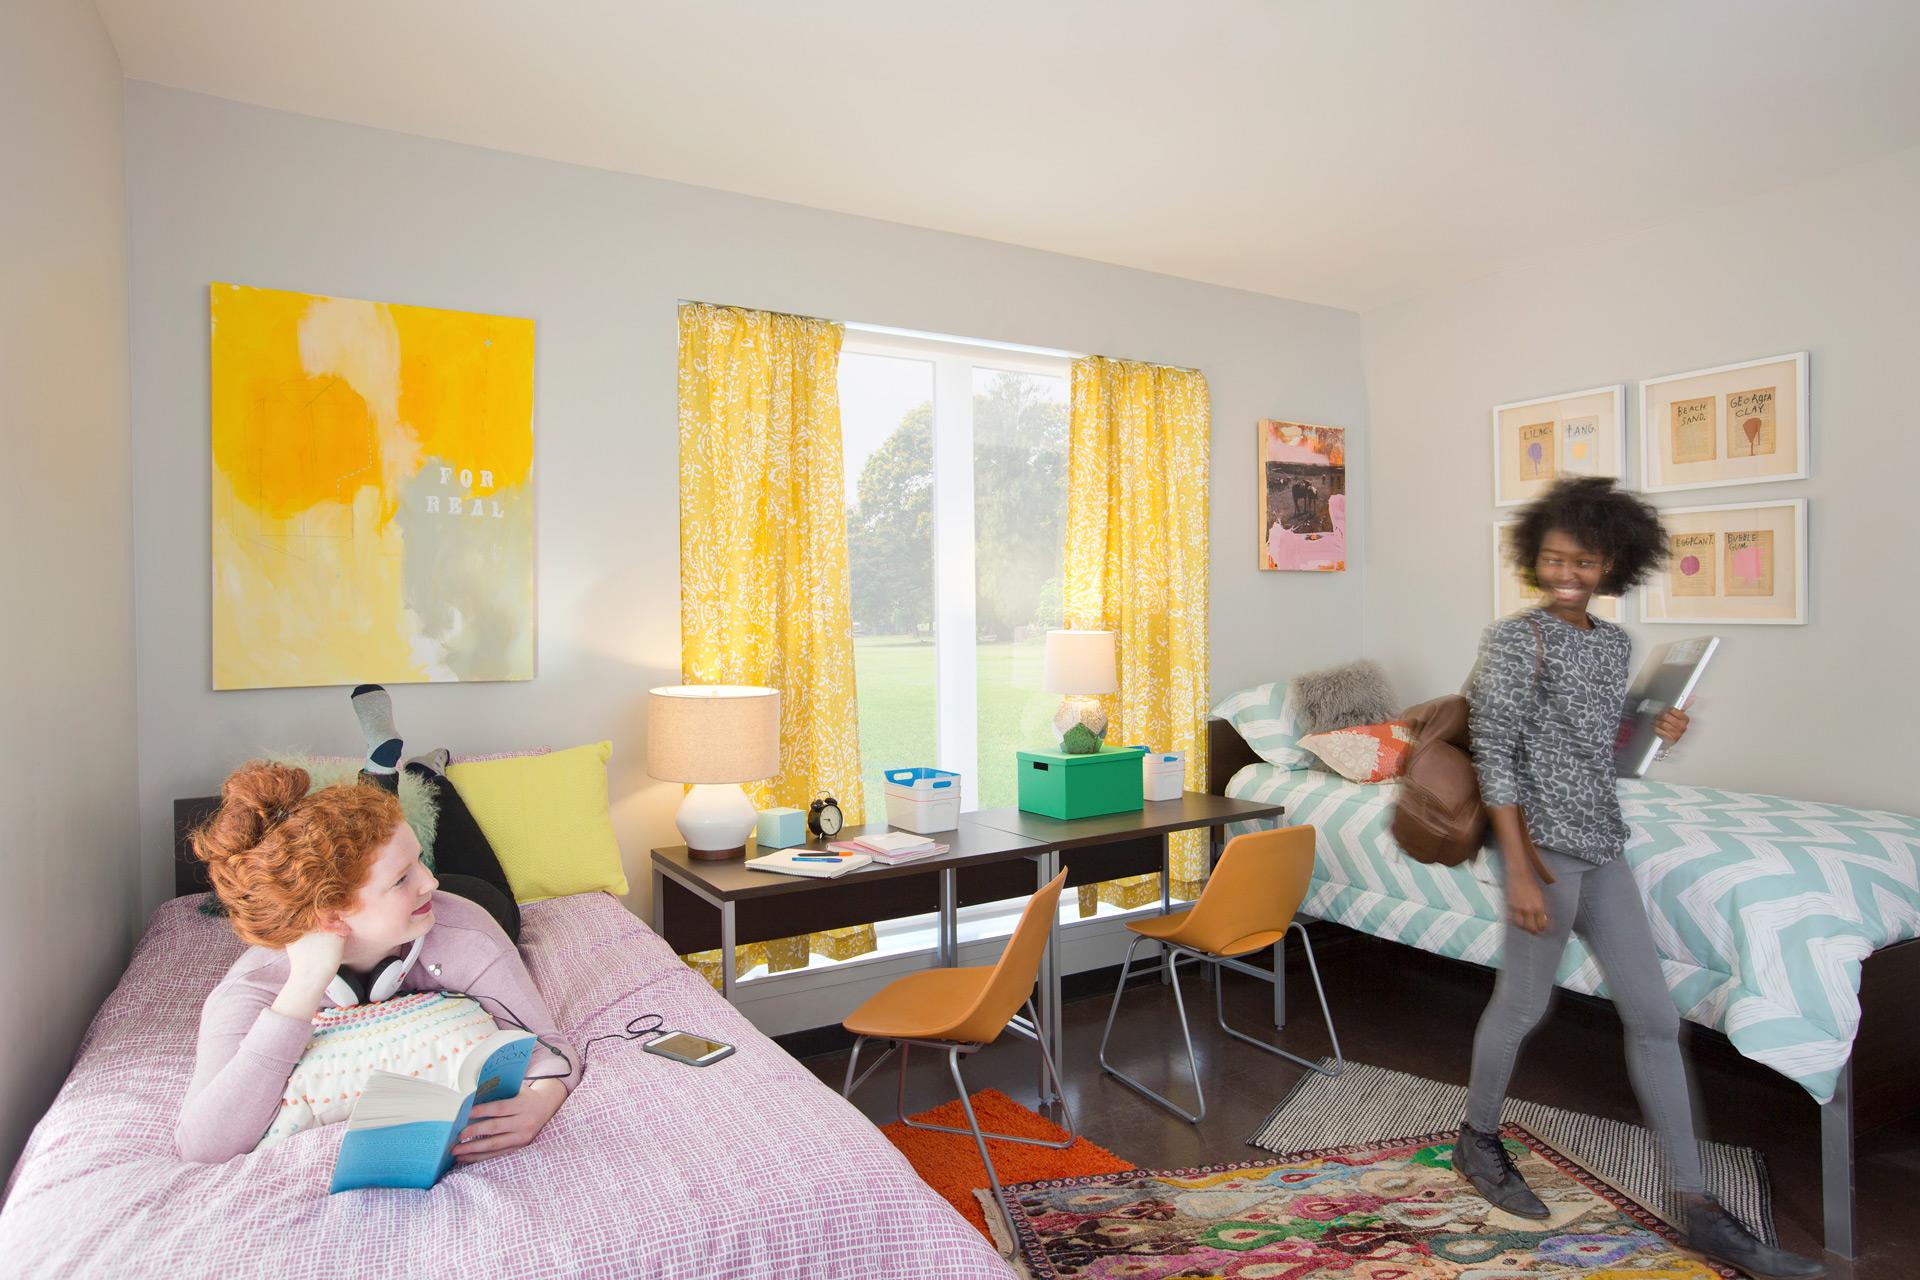 savannah residence halls open for freshmen who attended